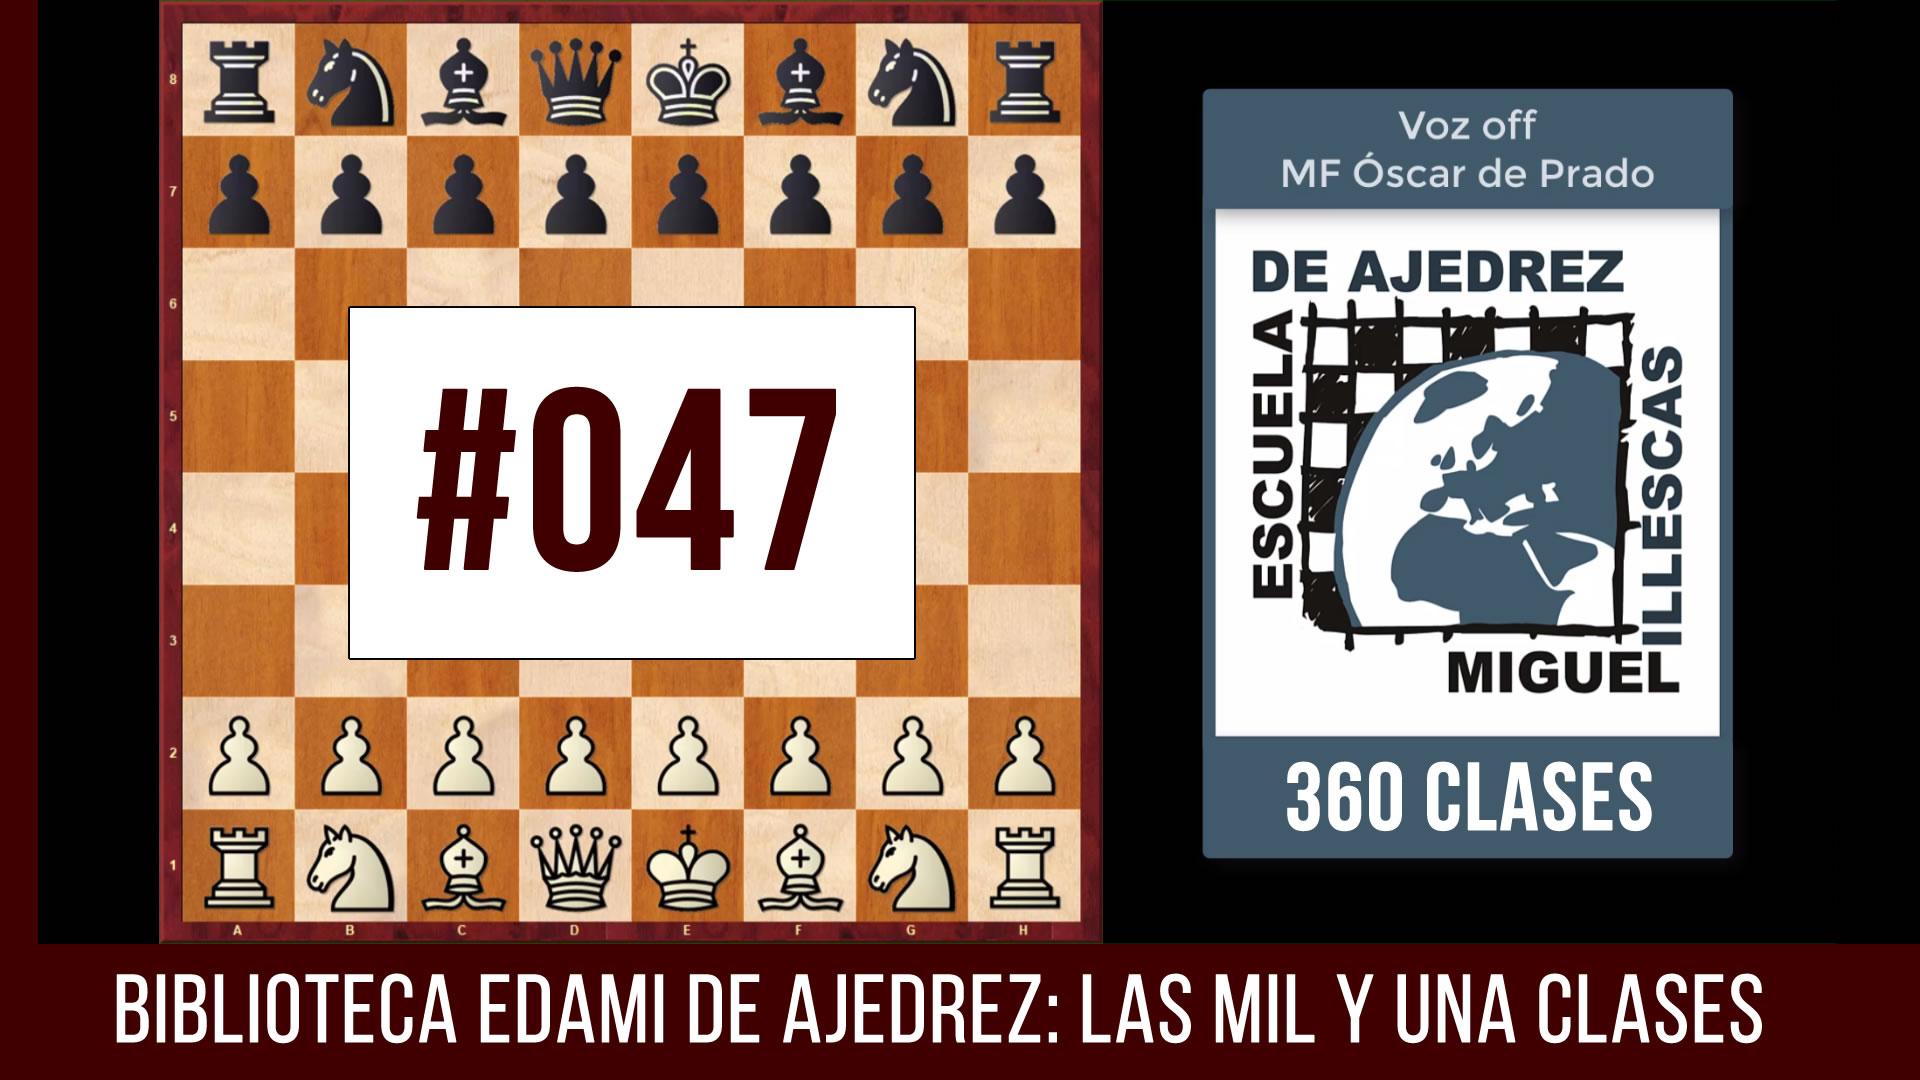 Clases de ajedrez #047 - EDAMI